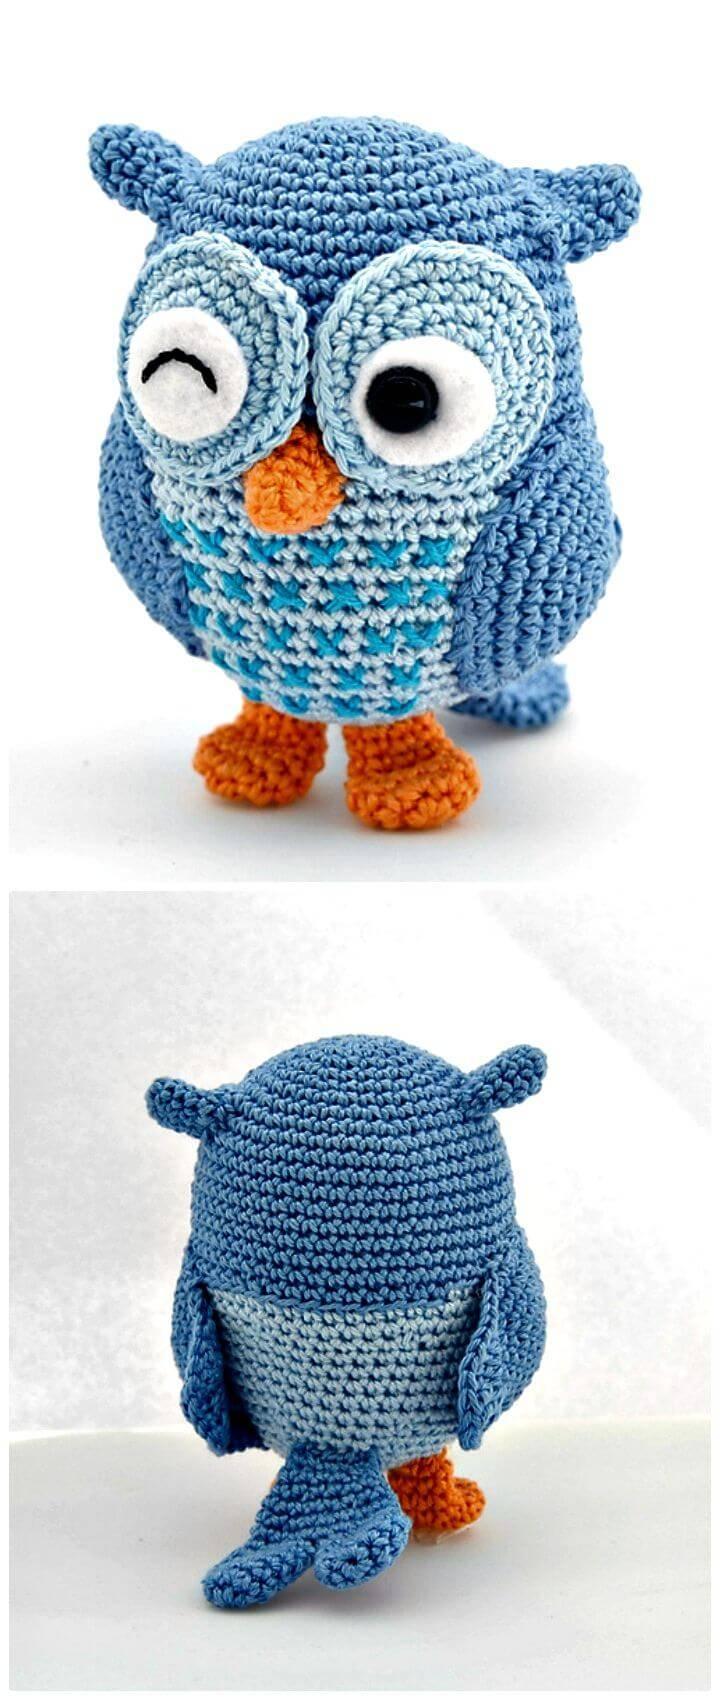 Free Crochet Jip The Owl Amigurumi Pattern